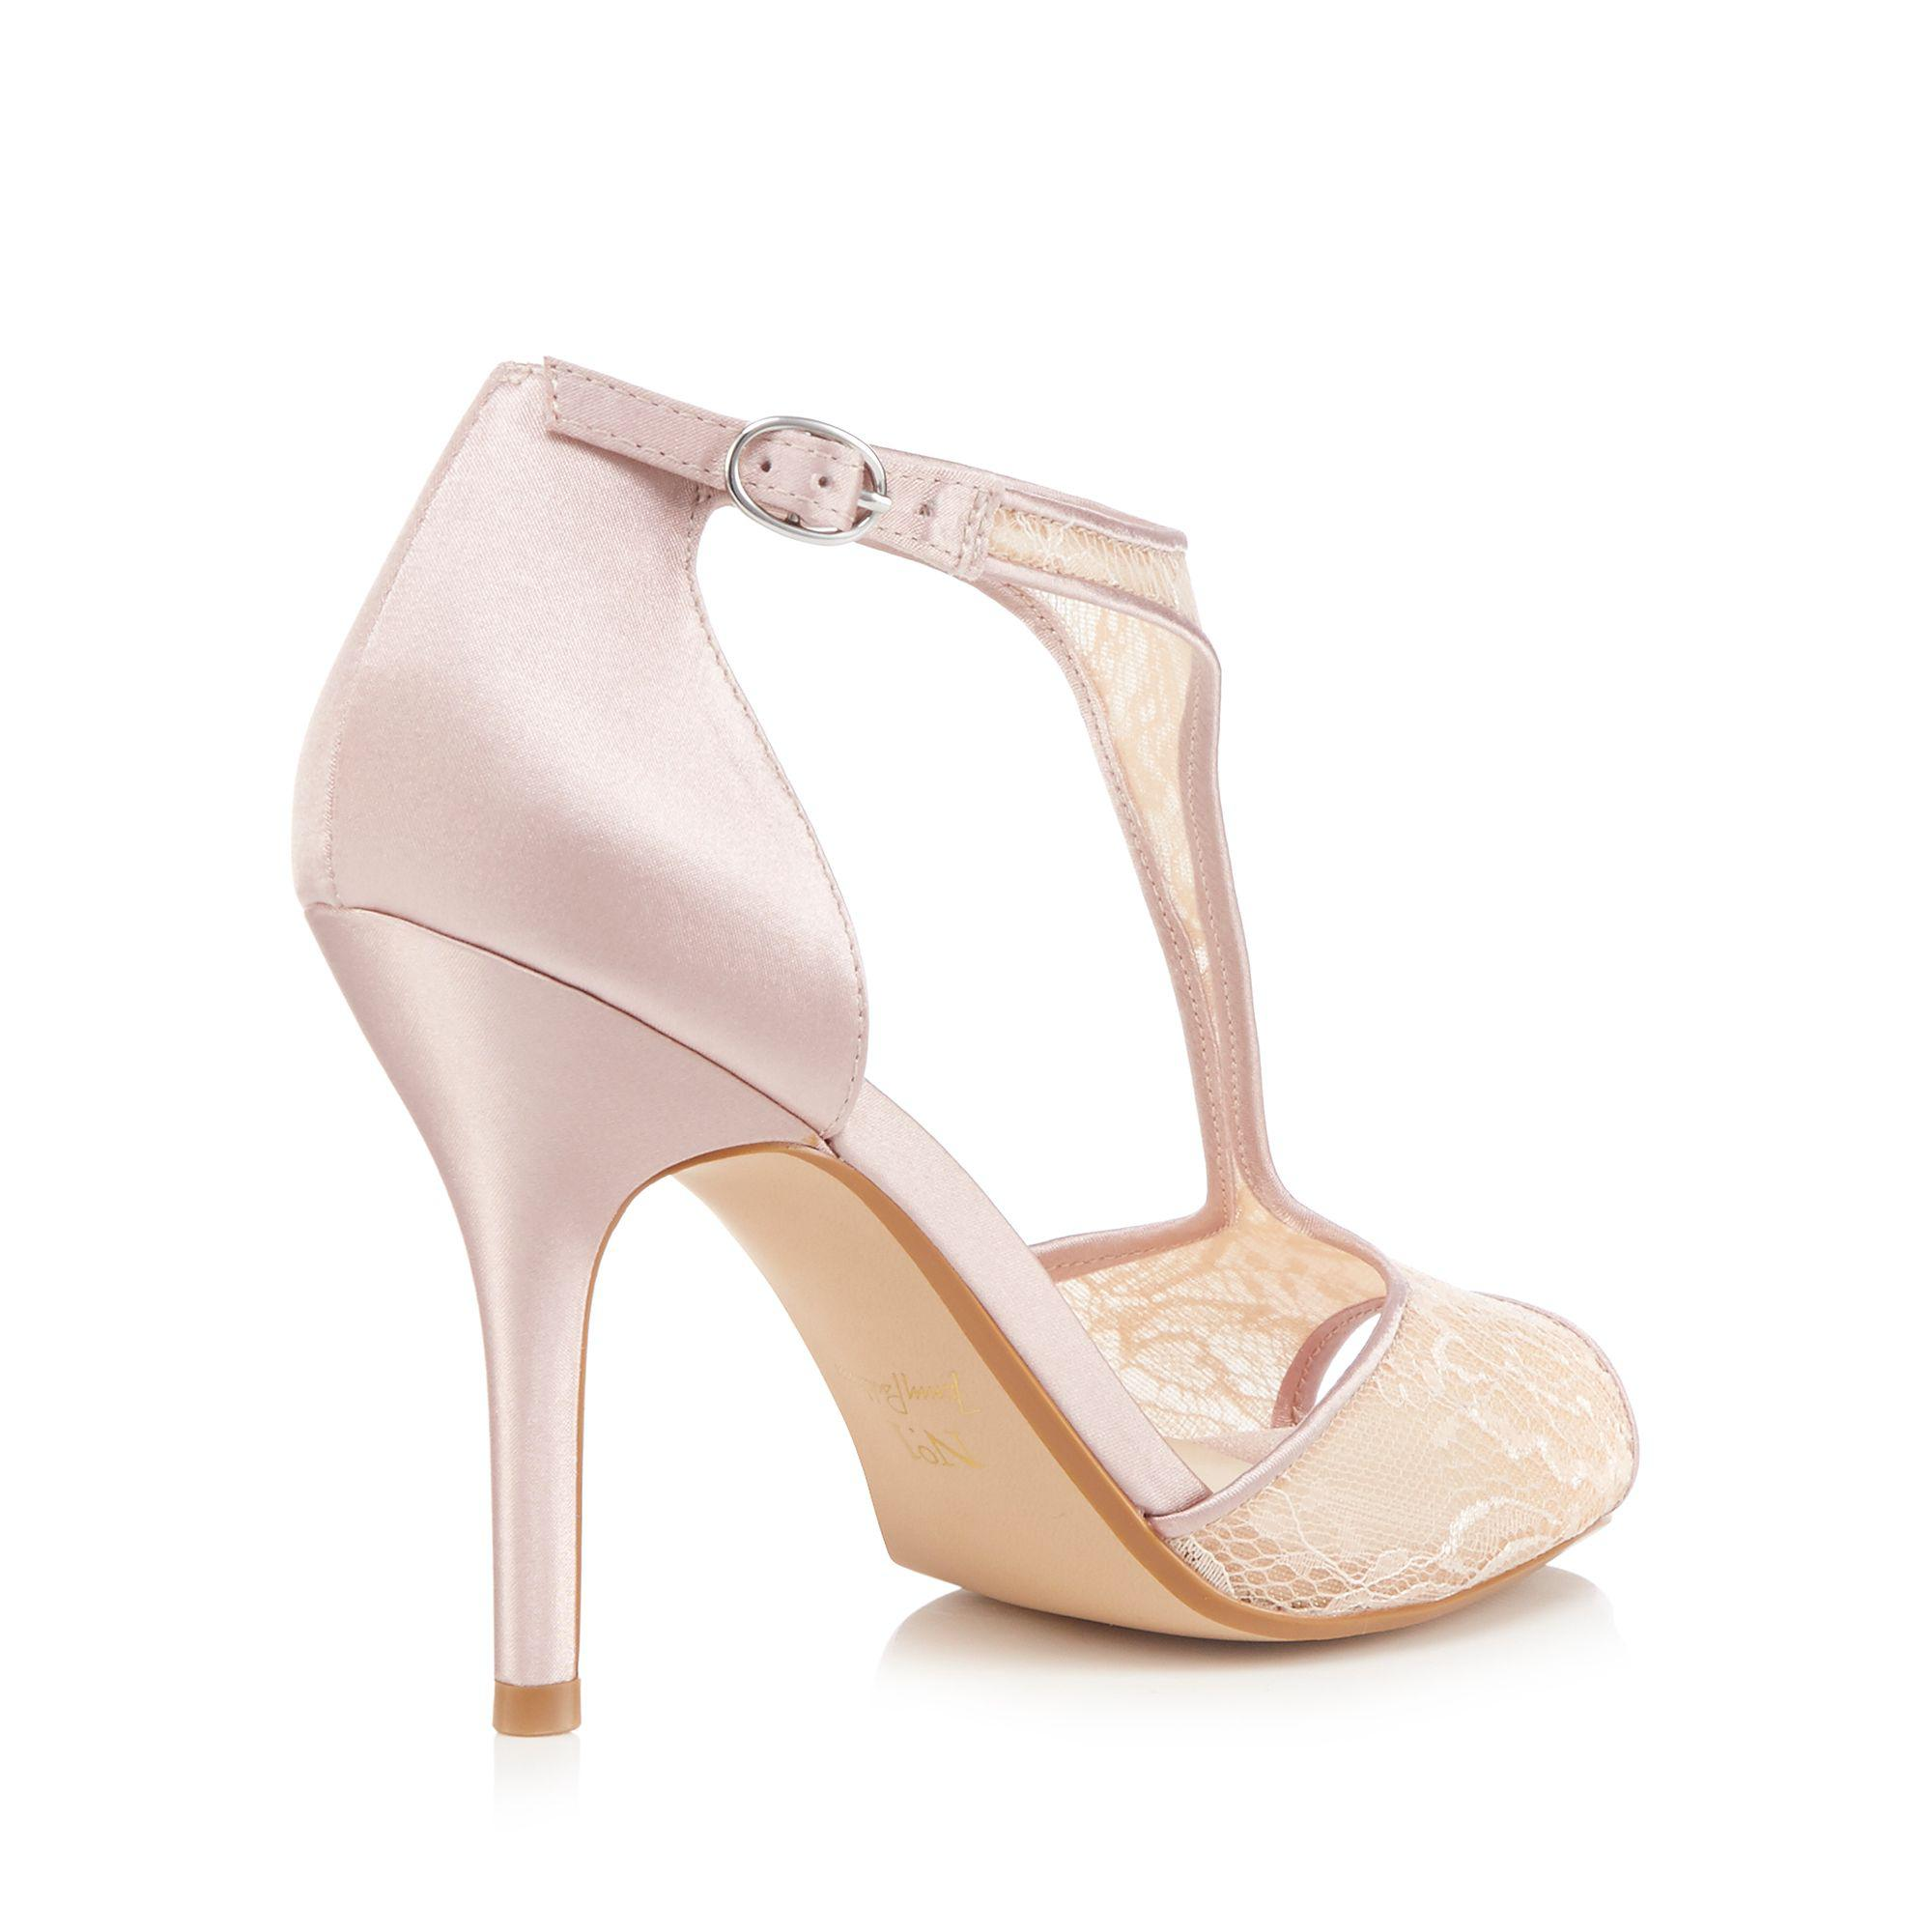 00b15aa2760 Jenny Packham Pink  peri  High Stiletto Heel T-bar Sandals in Pink ...